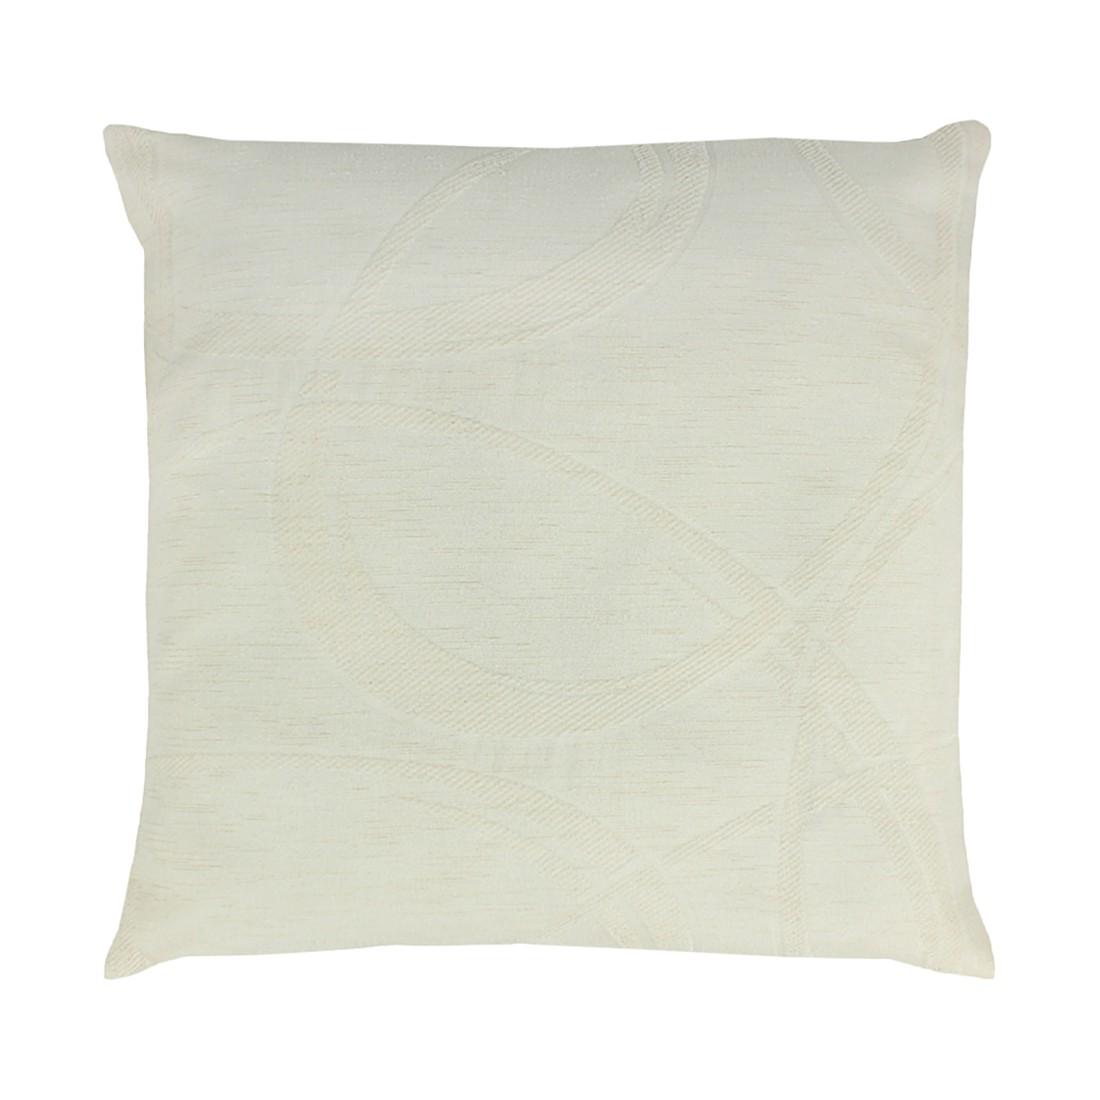 Kissenh lle fasnia beige 50 x 50 cm home wohnideen for Wohnideen gunstig